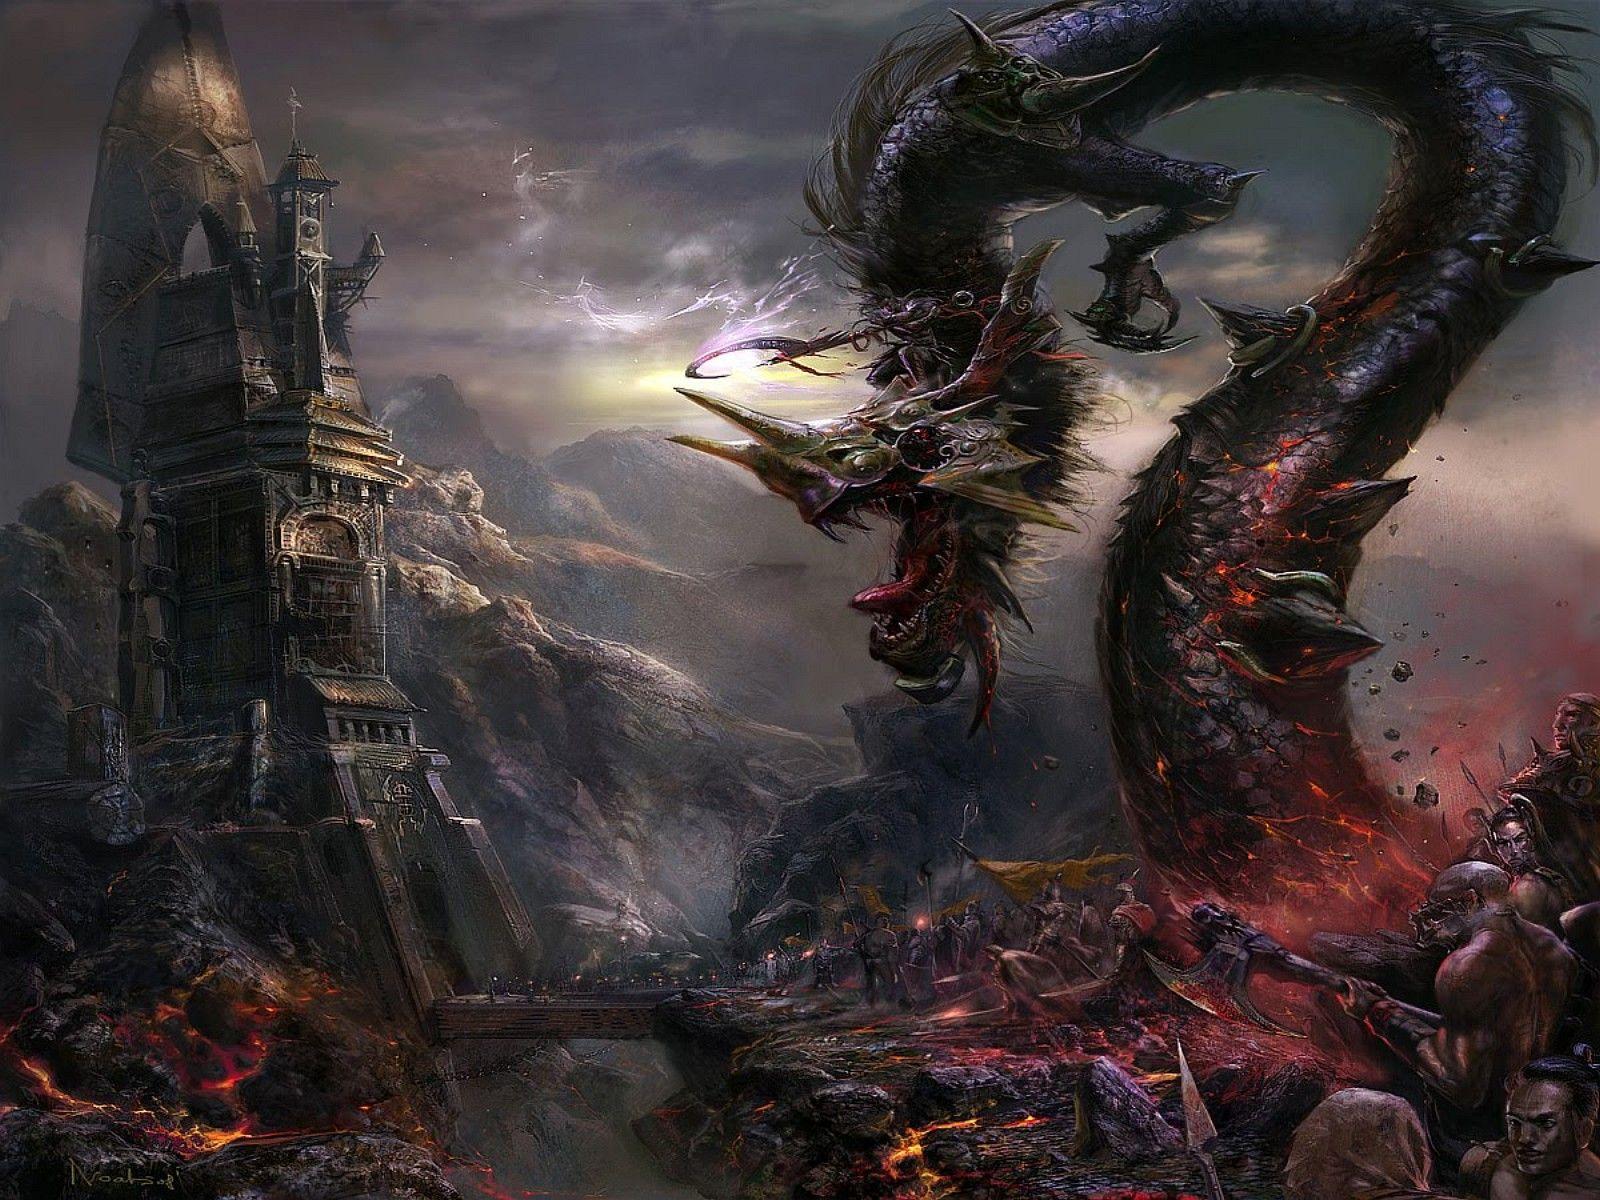 Gothic Dark Art Fantasy Dragon picture nr 55917 1600x1200